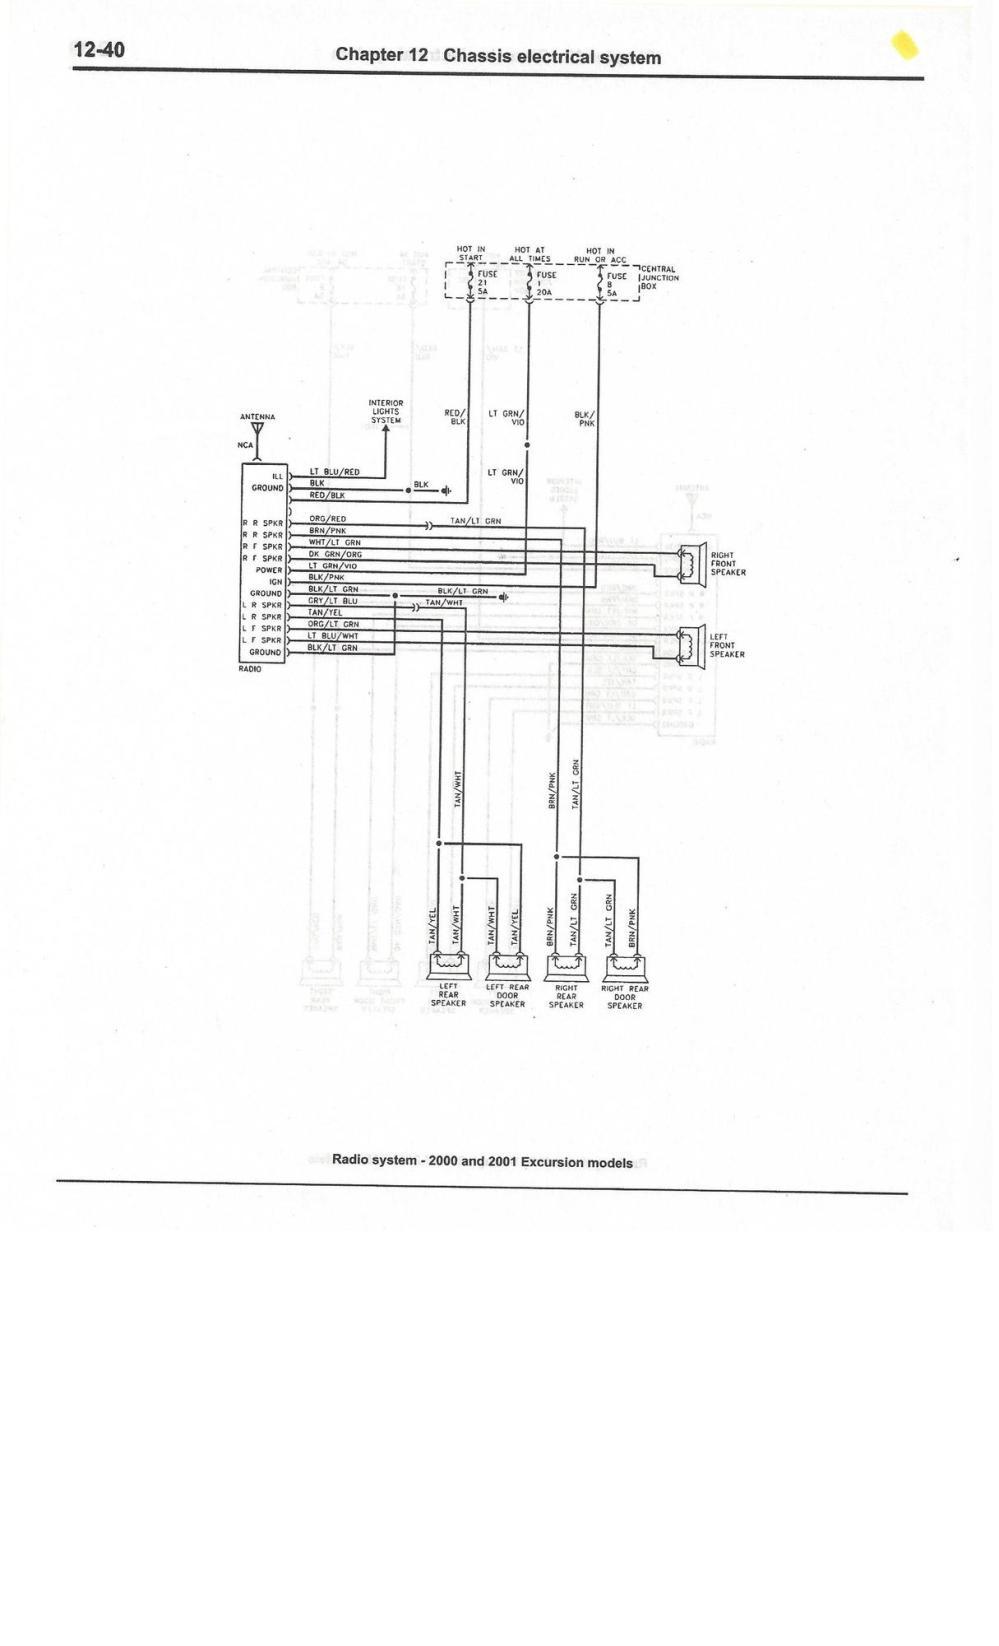 medium resolution of 46 willys cj2a wiring diagram willys cj3a wiring diagram 1947 willys cj2a wiring diagram